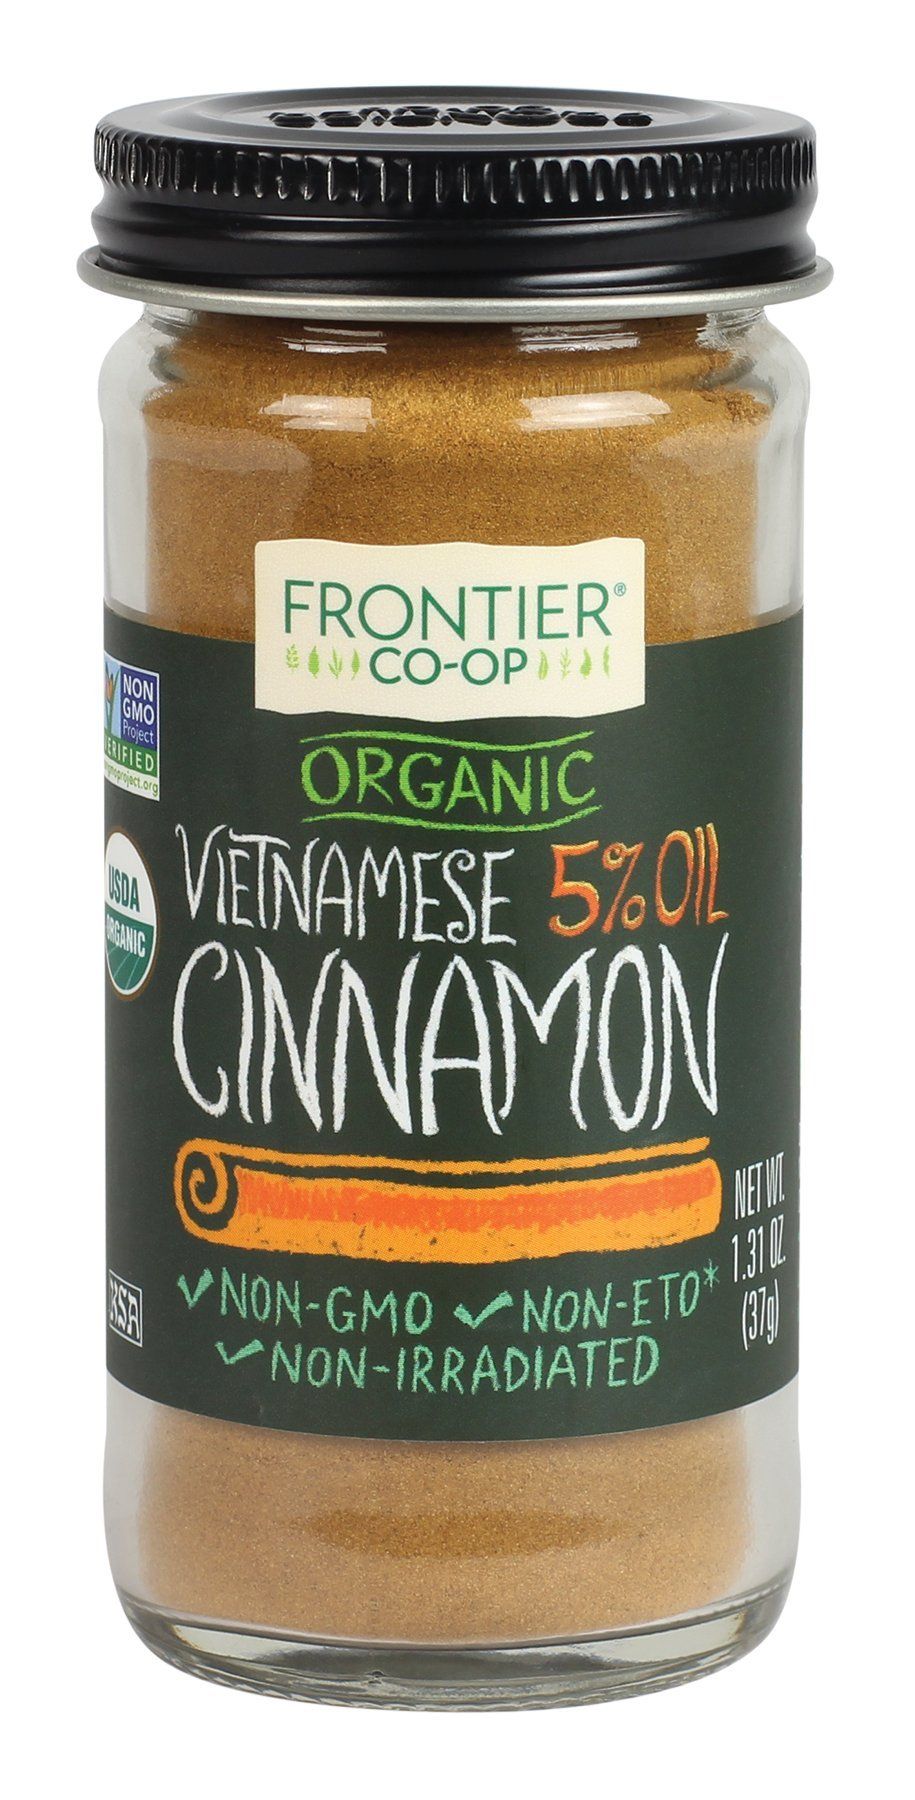 Frontier Organic Vietnamese Cinnamon, Ground, 1.31 Ounce